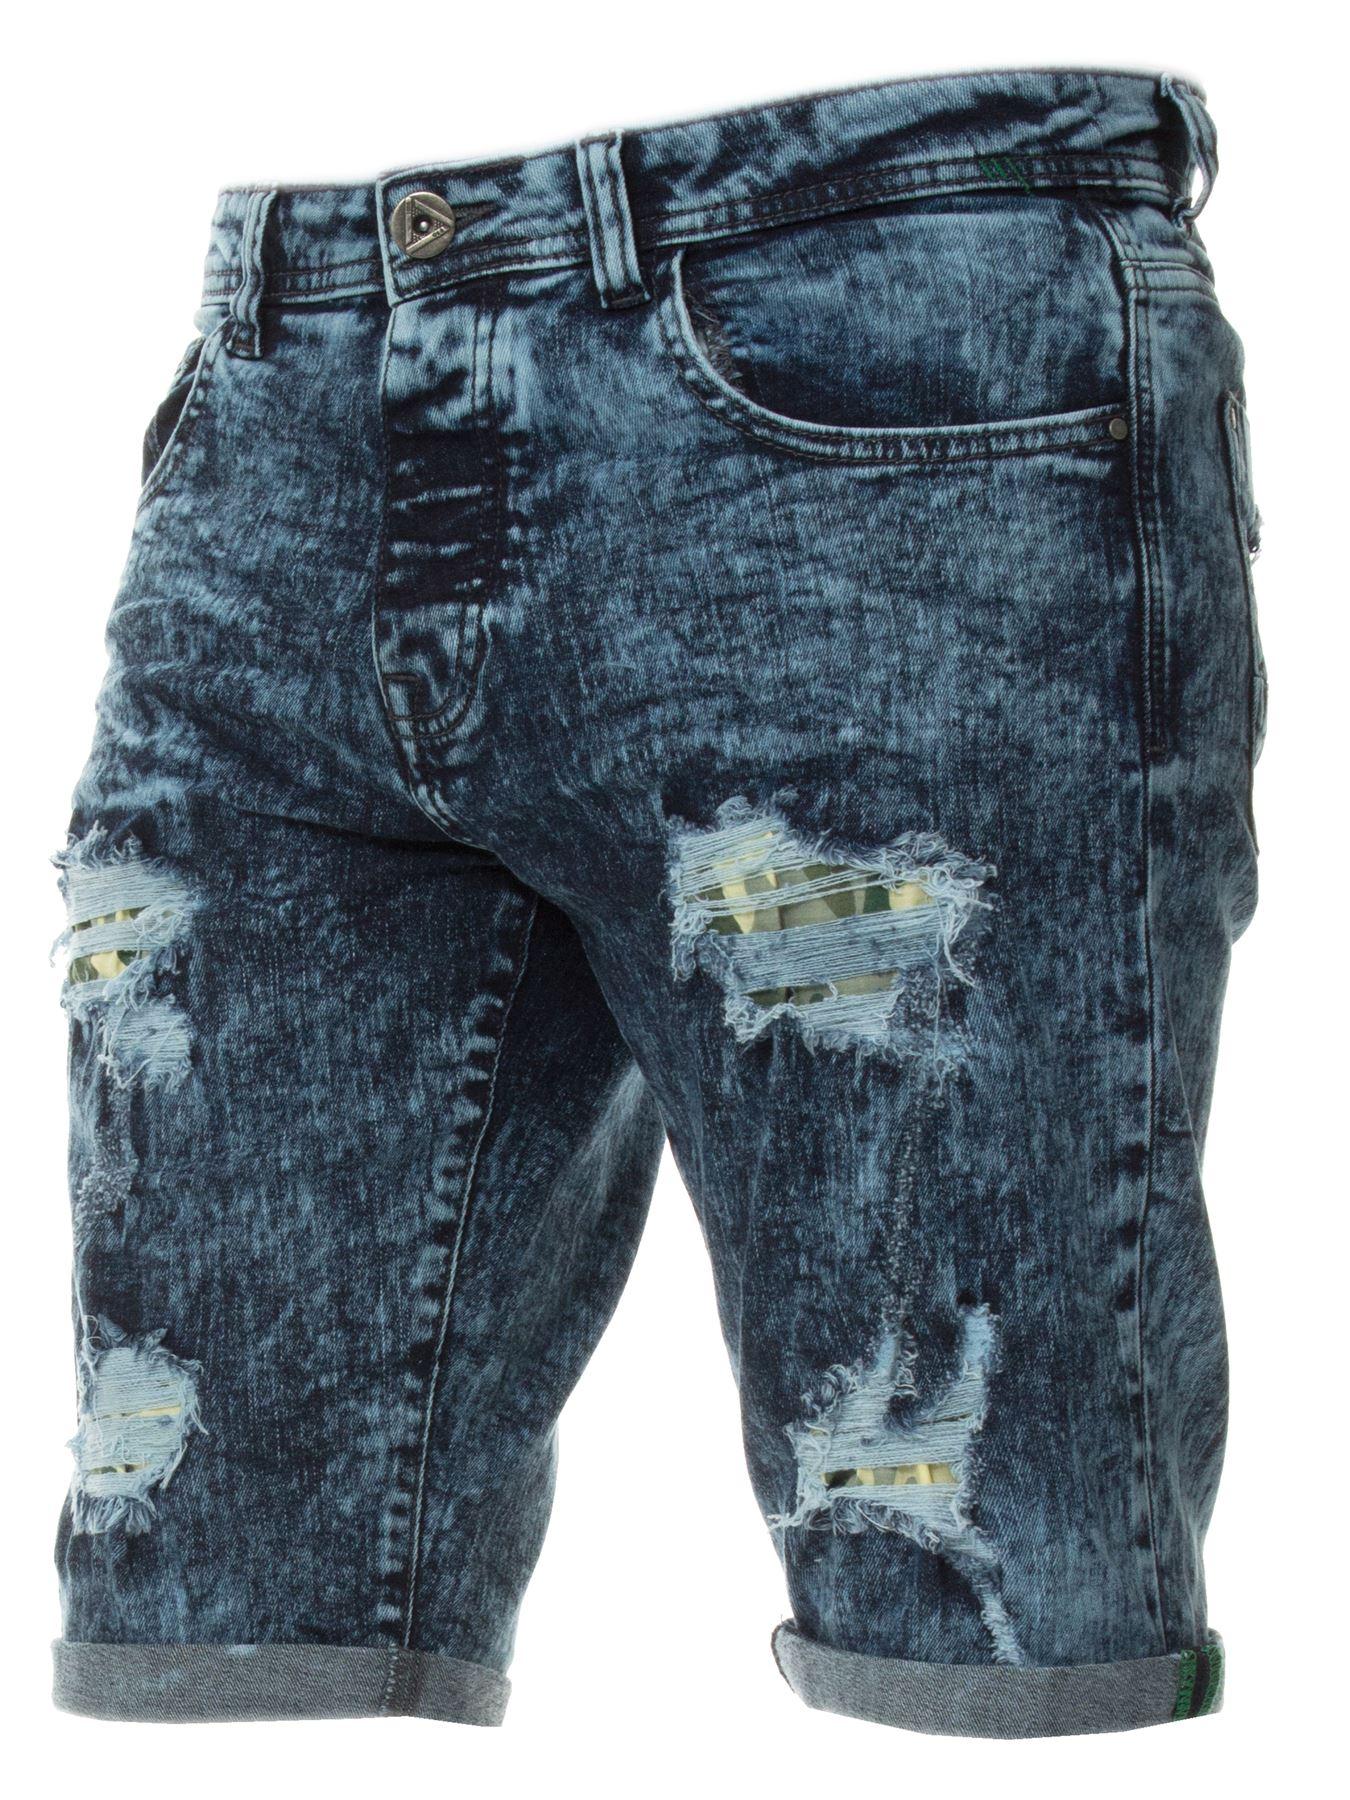 Mens-Denim-Shorts-ETO-Jeans-Stretch-Slim-Fit-Distressed-Ripped-Blue-Half-Pants thumbnail 3